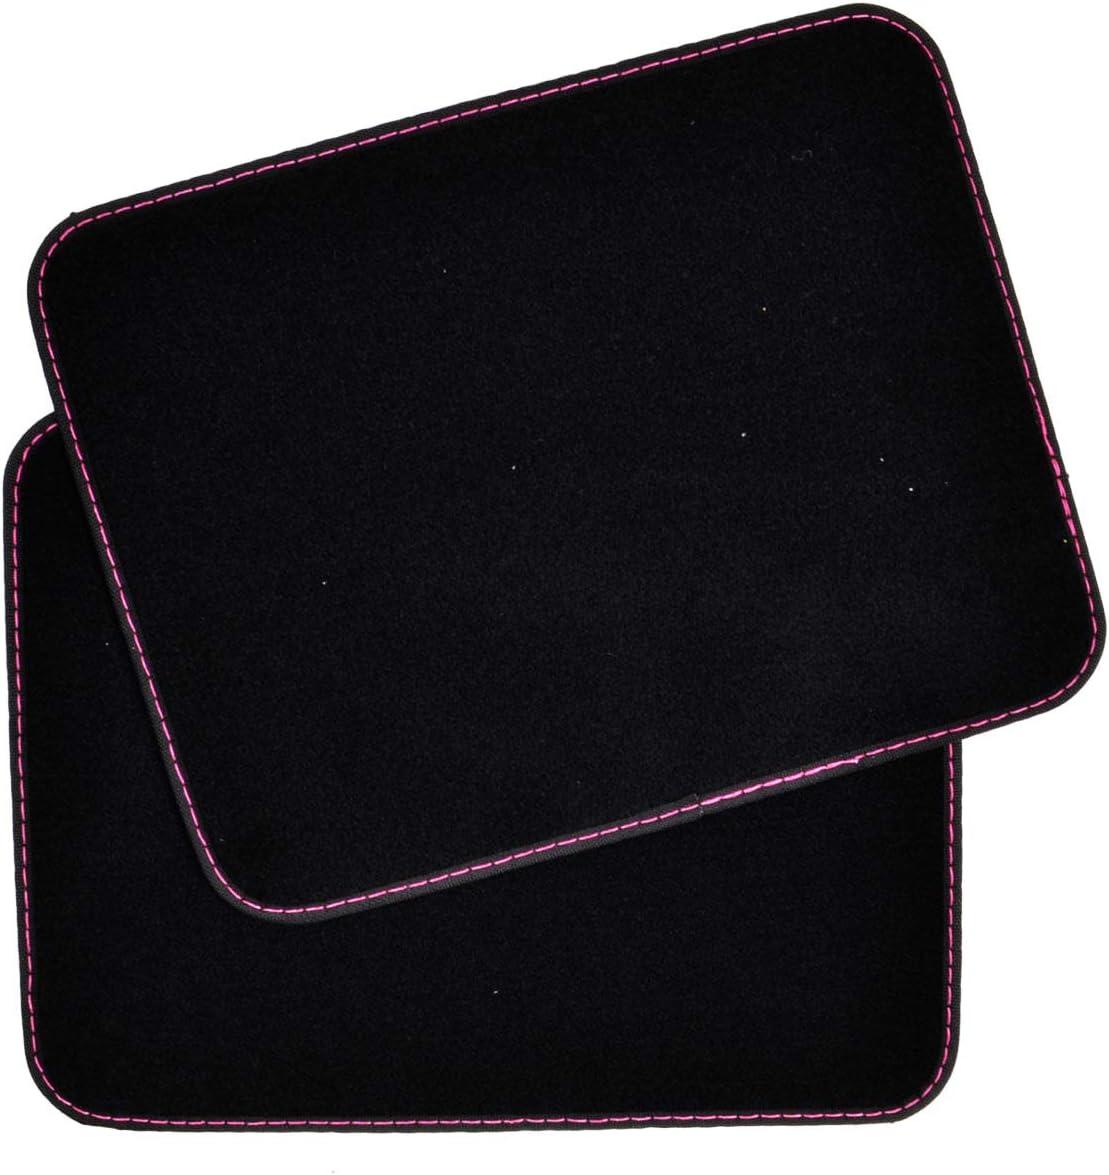 Rubber Backing Heavy Duty Carpet Original Design Boss Lady BDK 4 Pieces Car Floor Mats